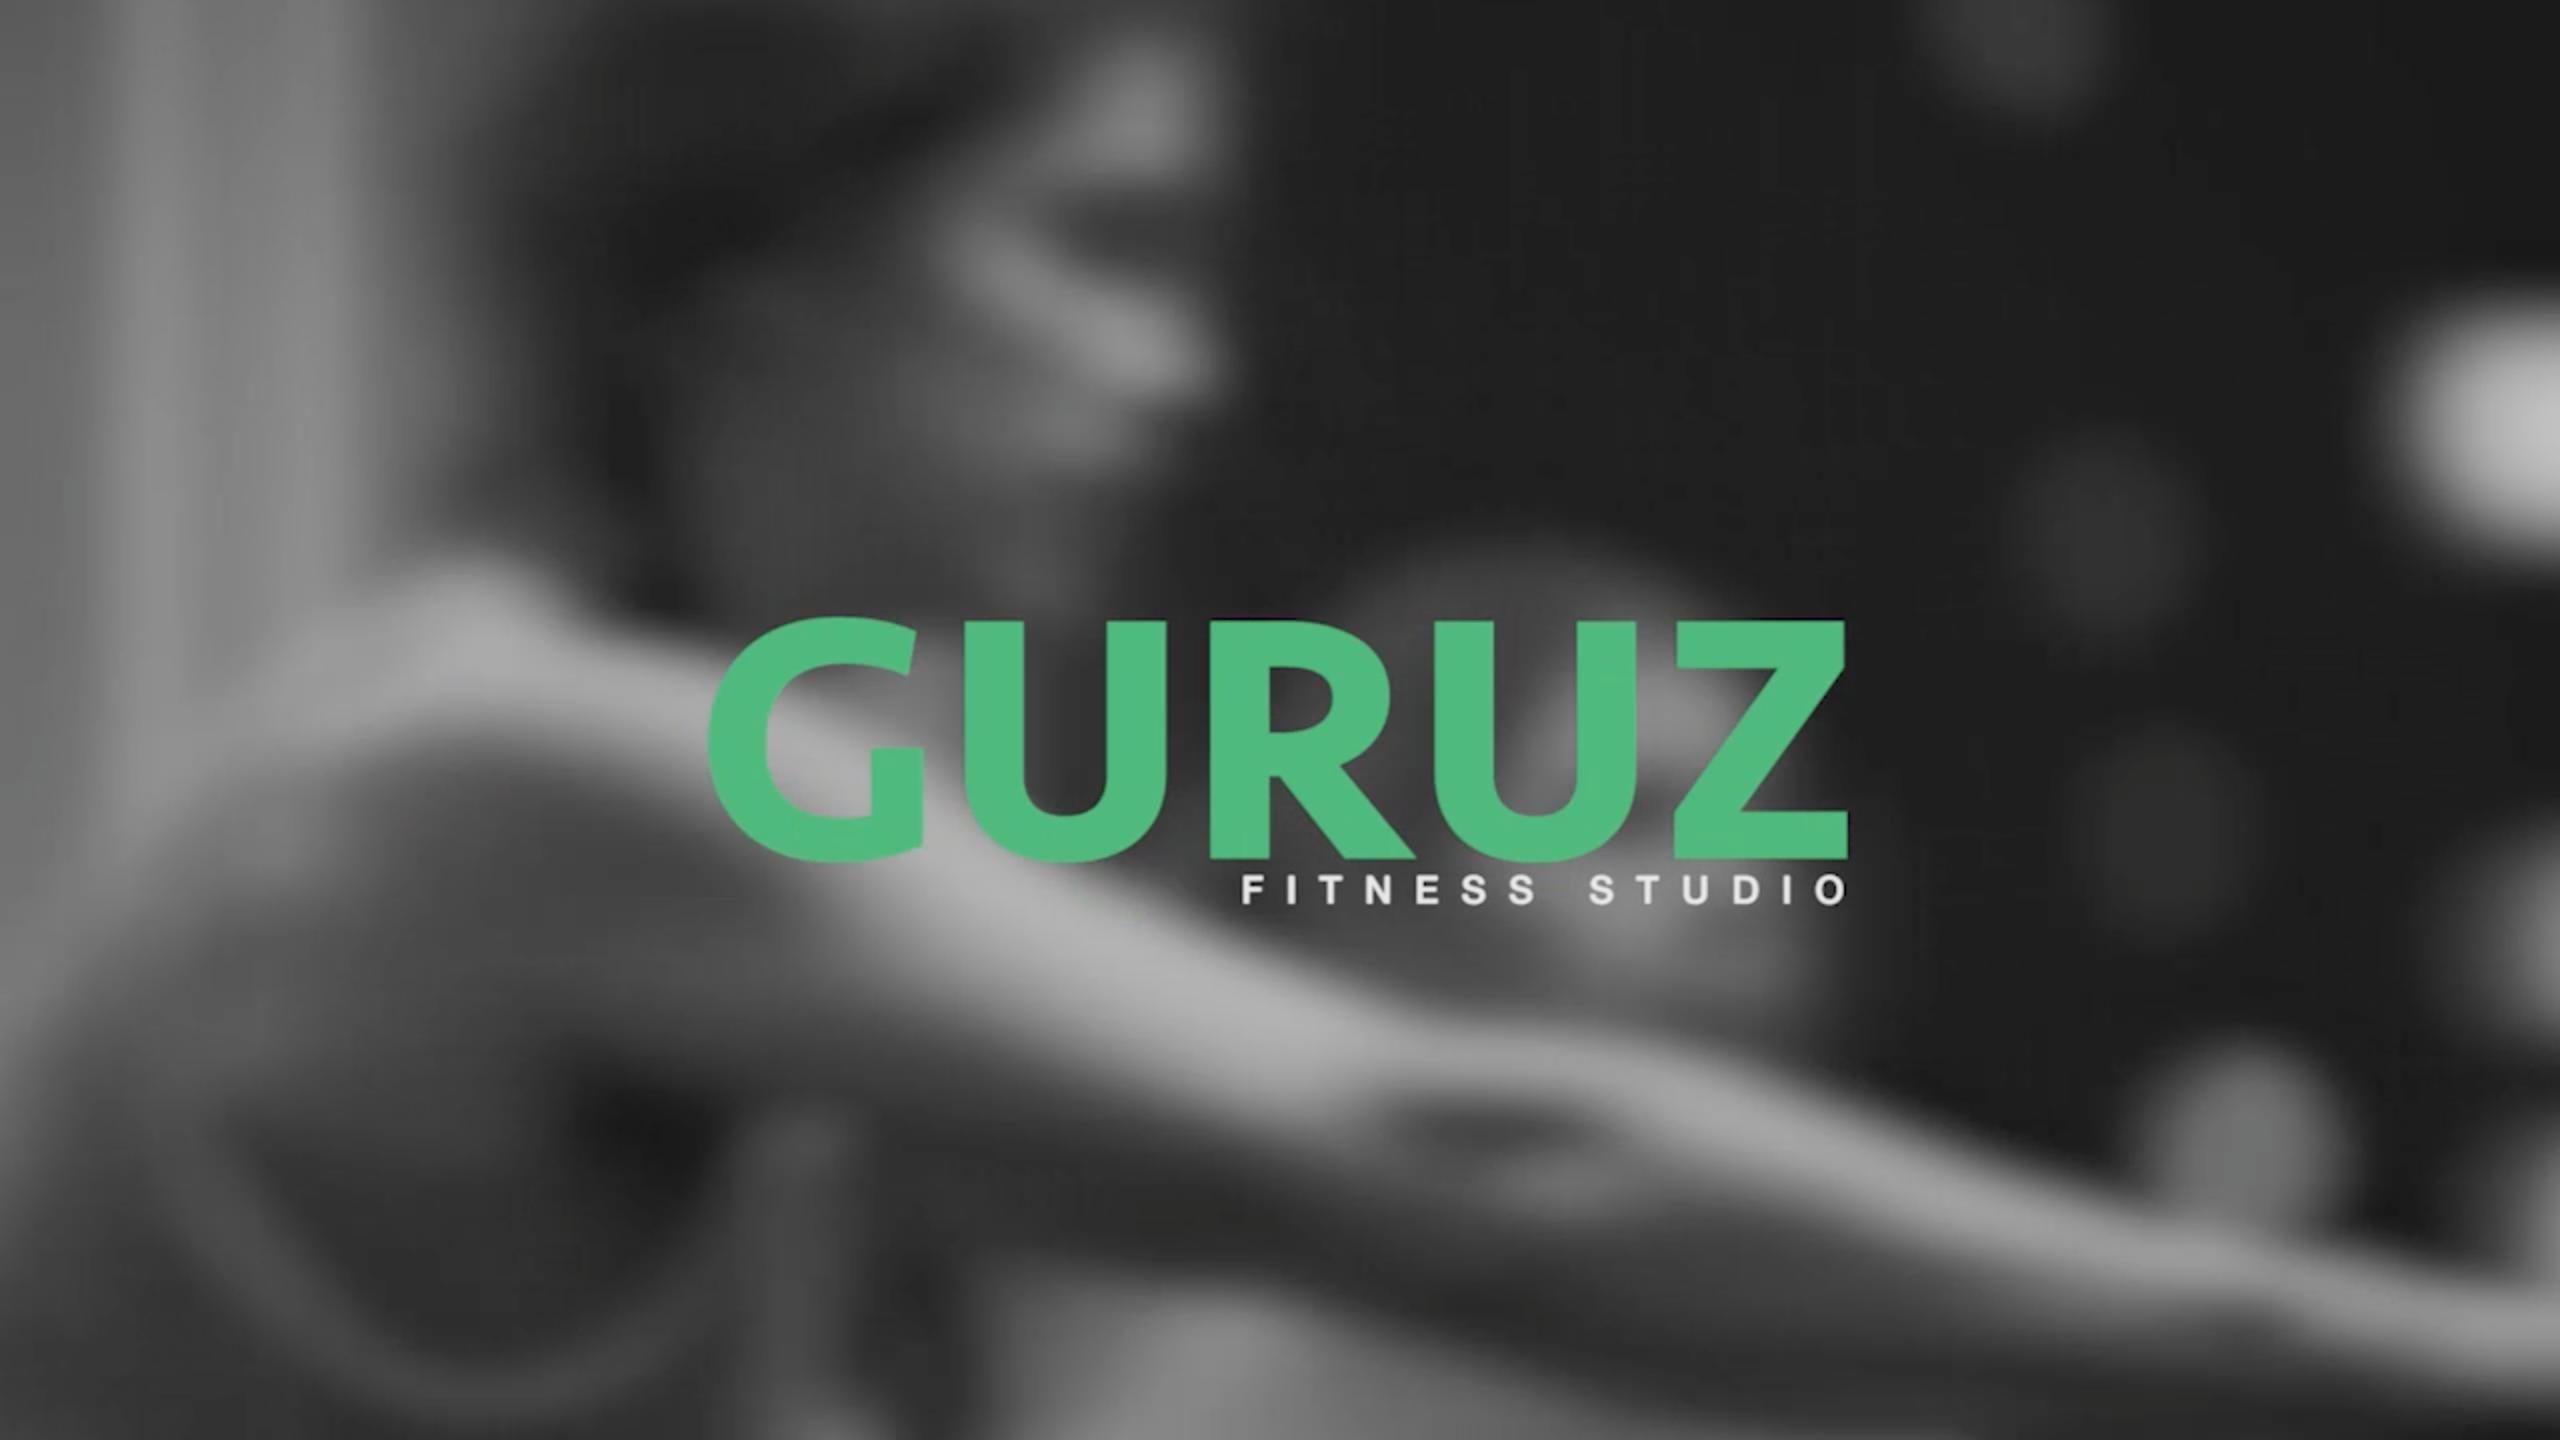 GuruzFitnessStudio_c3